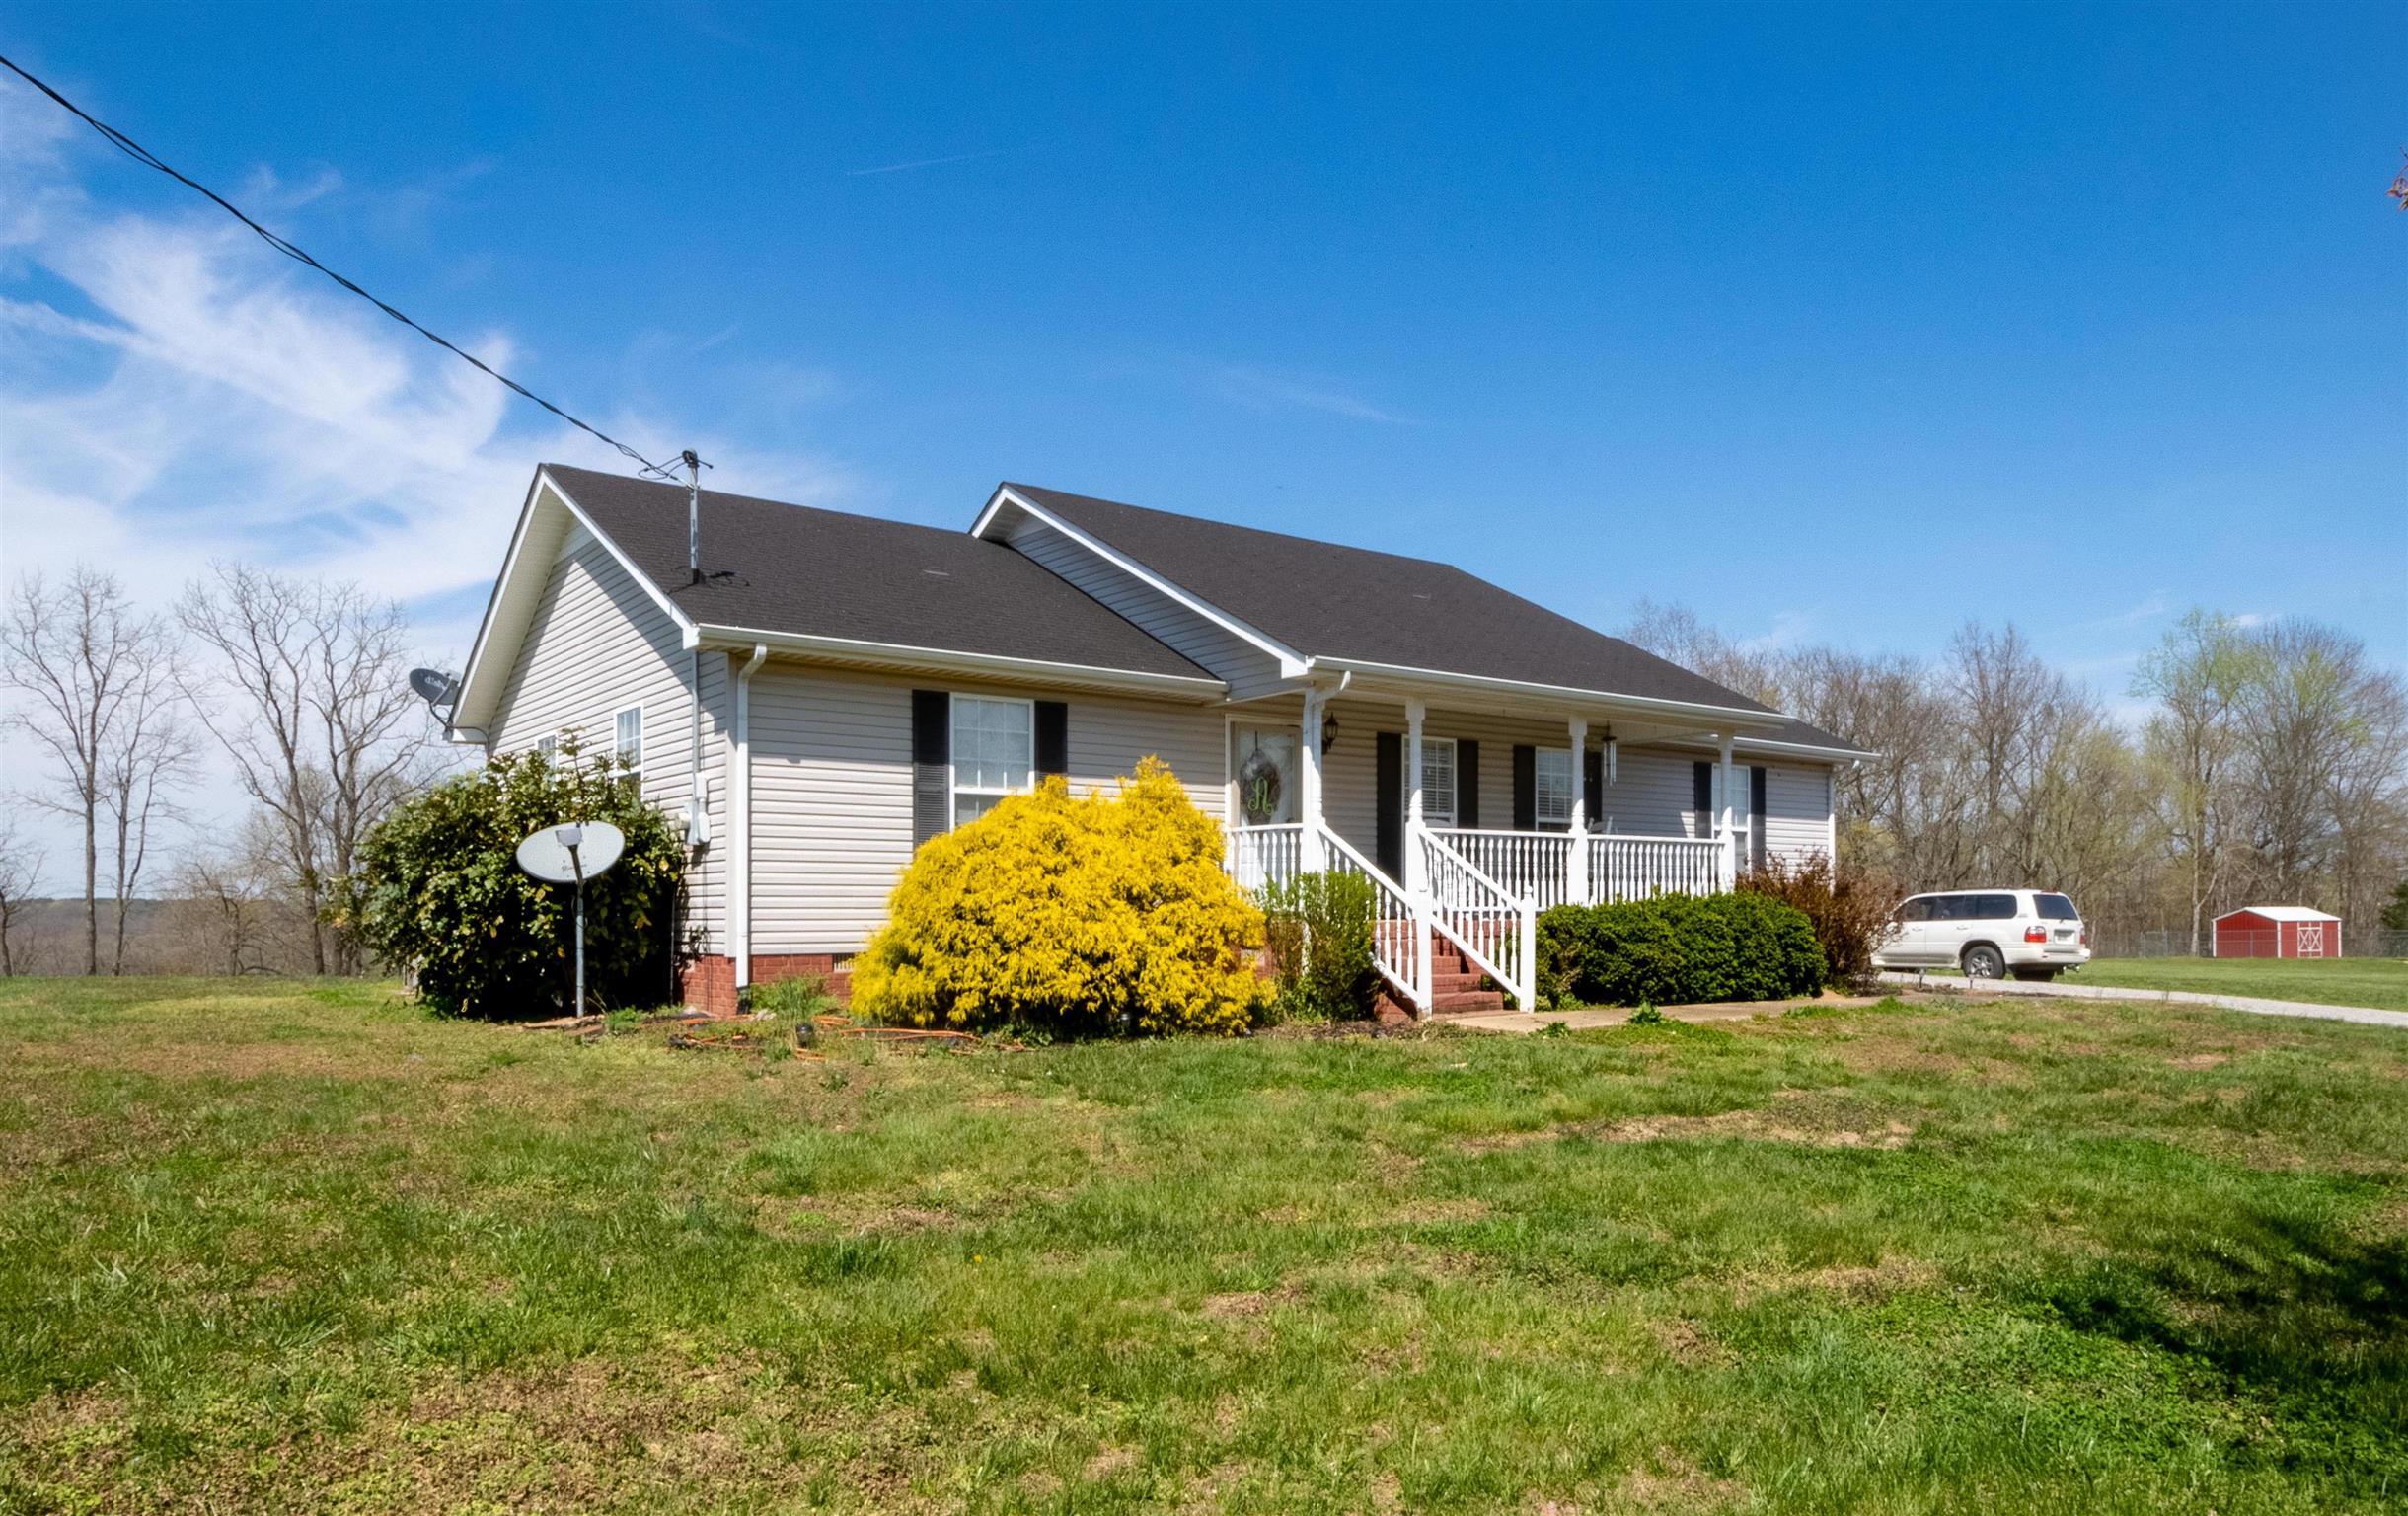 6209 Little Dry Creek Rd, Pulaski, TN 38478 - Pulaski, TN real estate listing